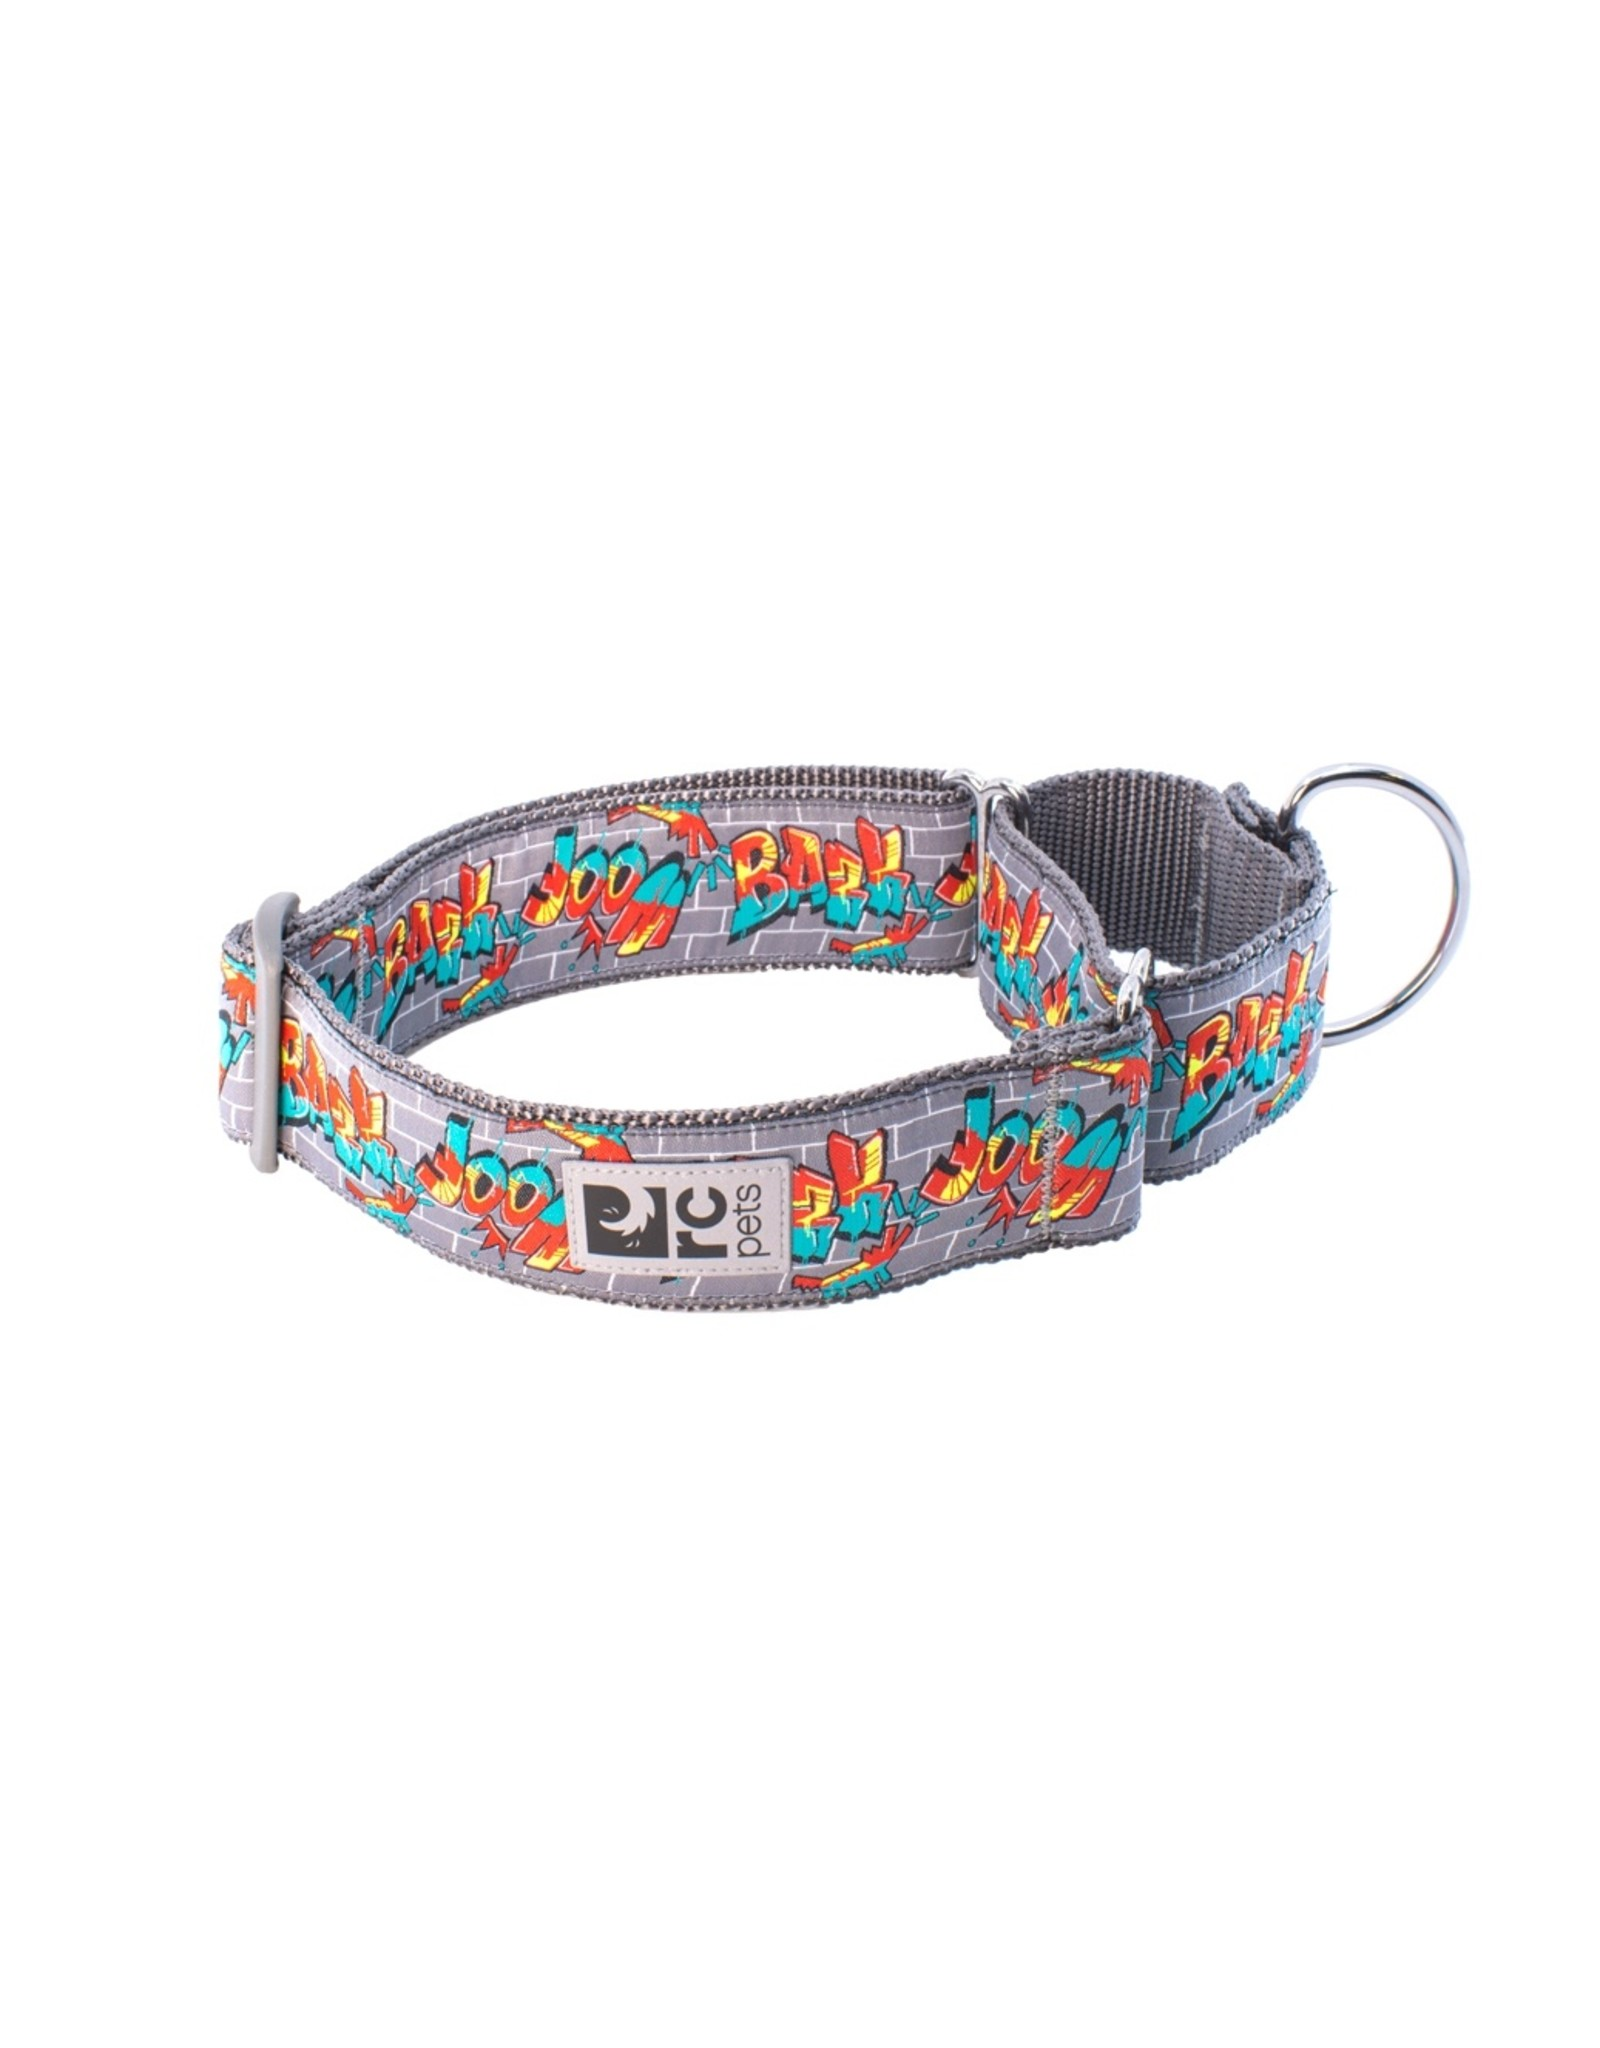 RC Pets All Webbing Training Collar